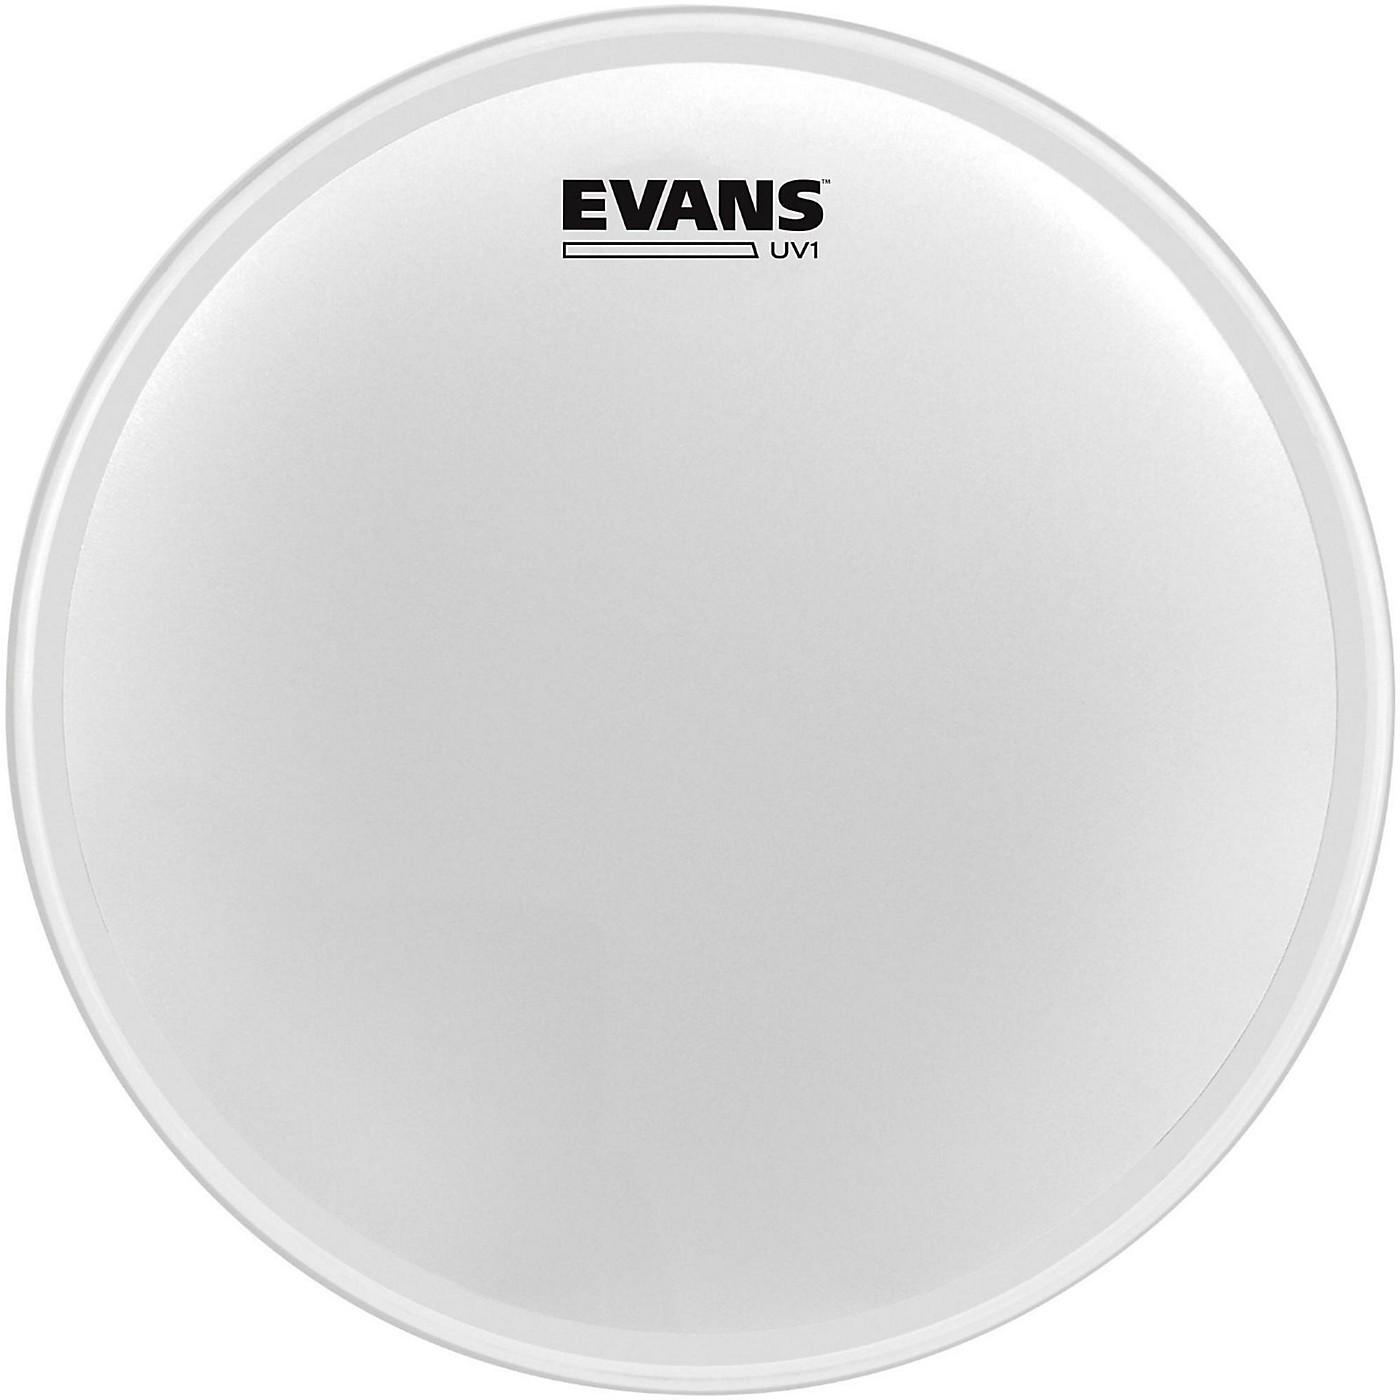 Evans UV1 Coated Drum Head thumbnail